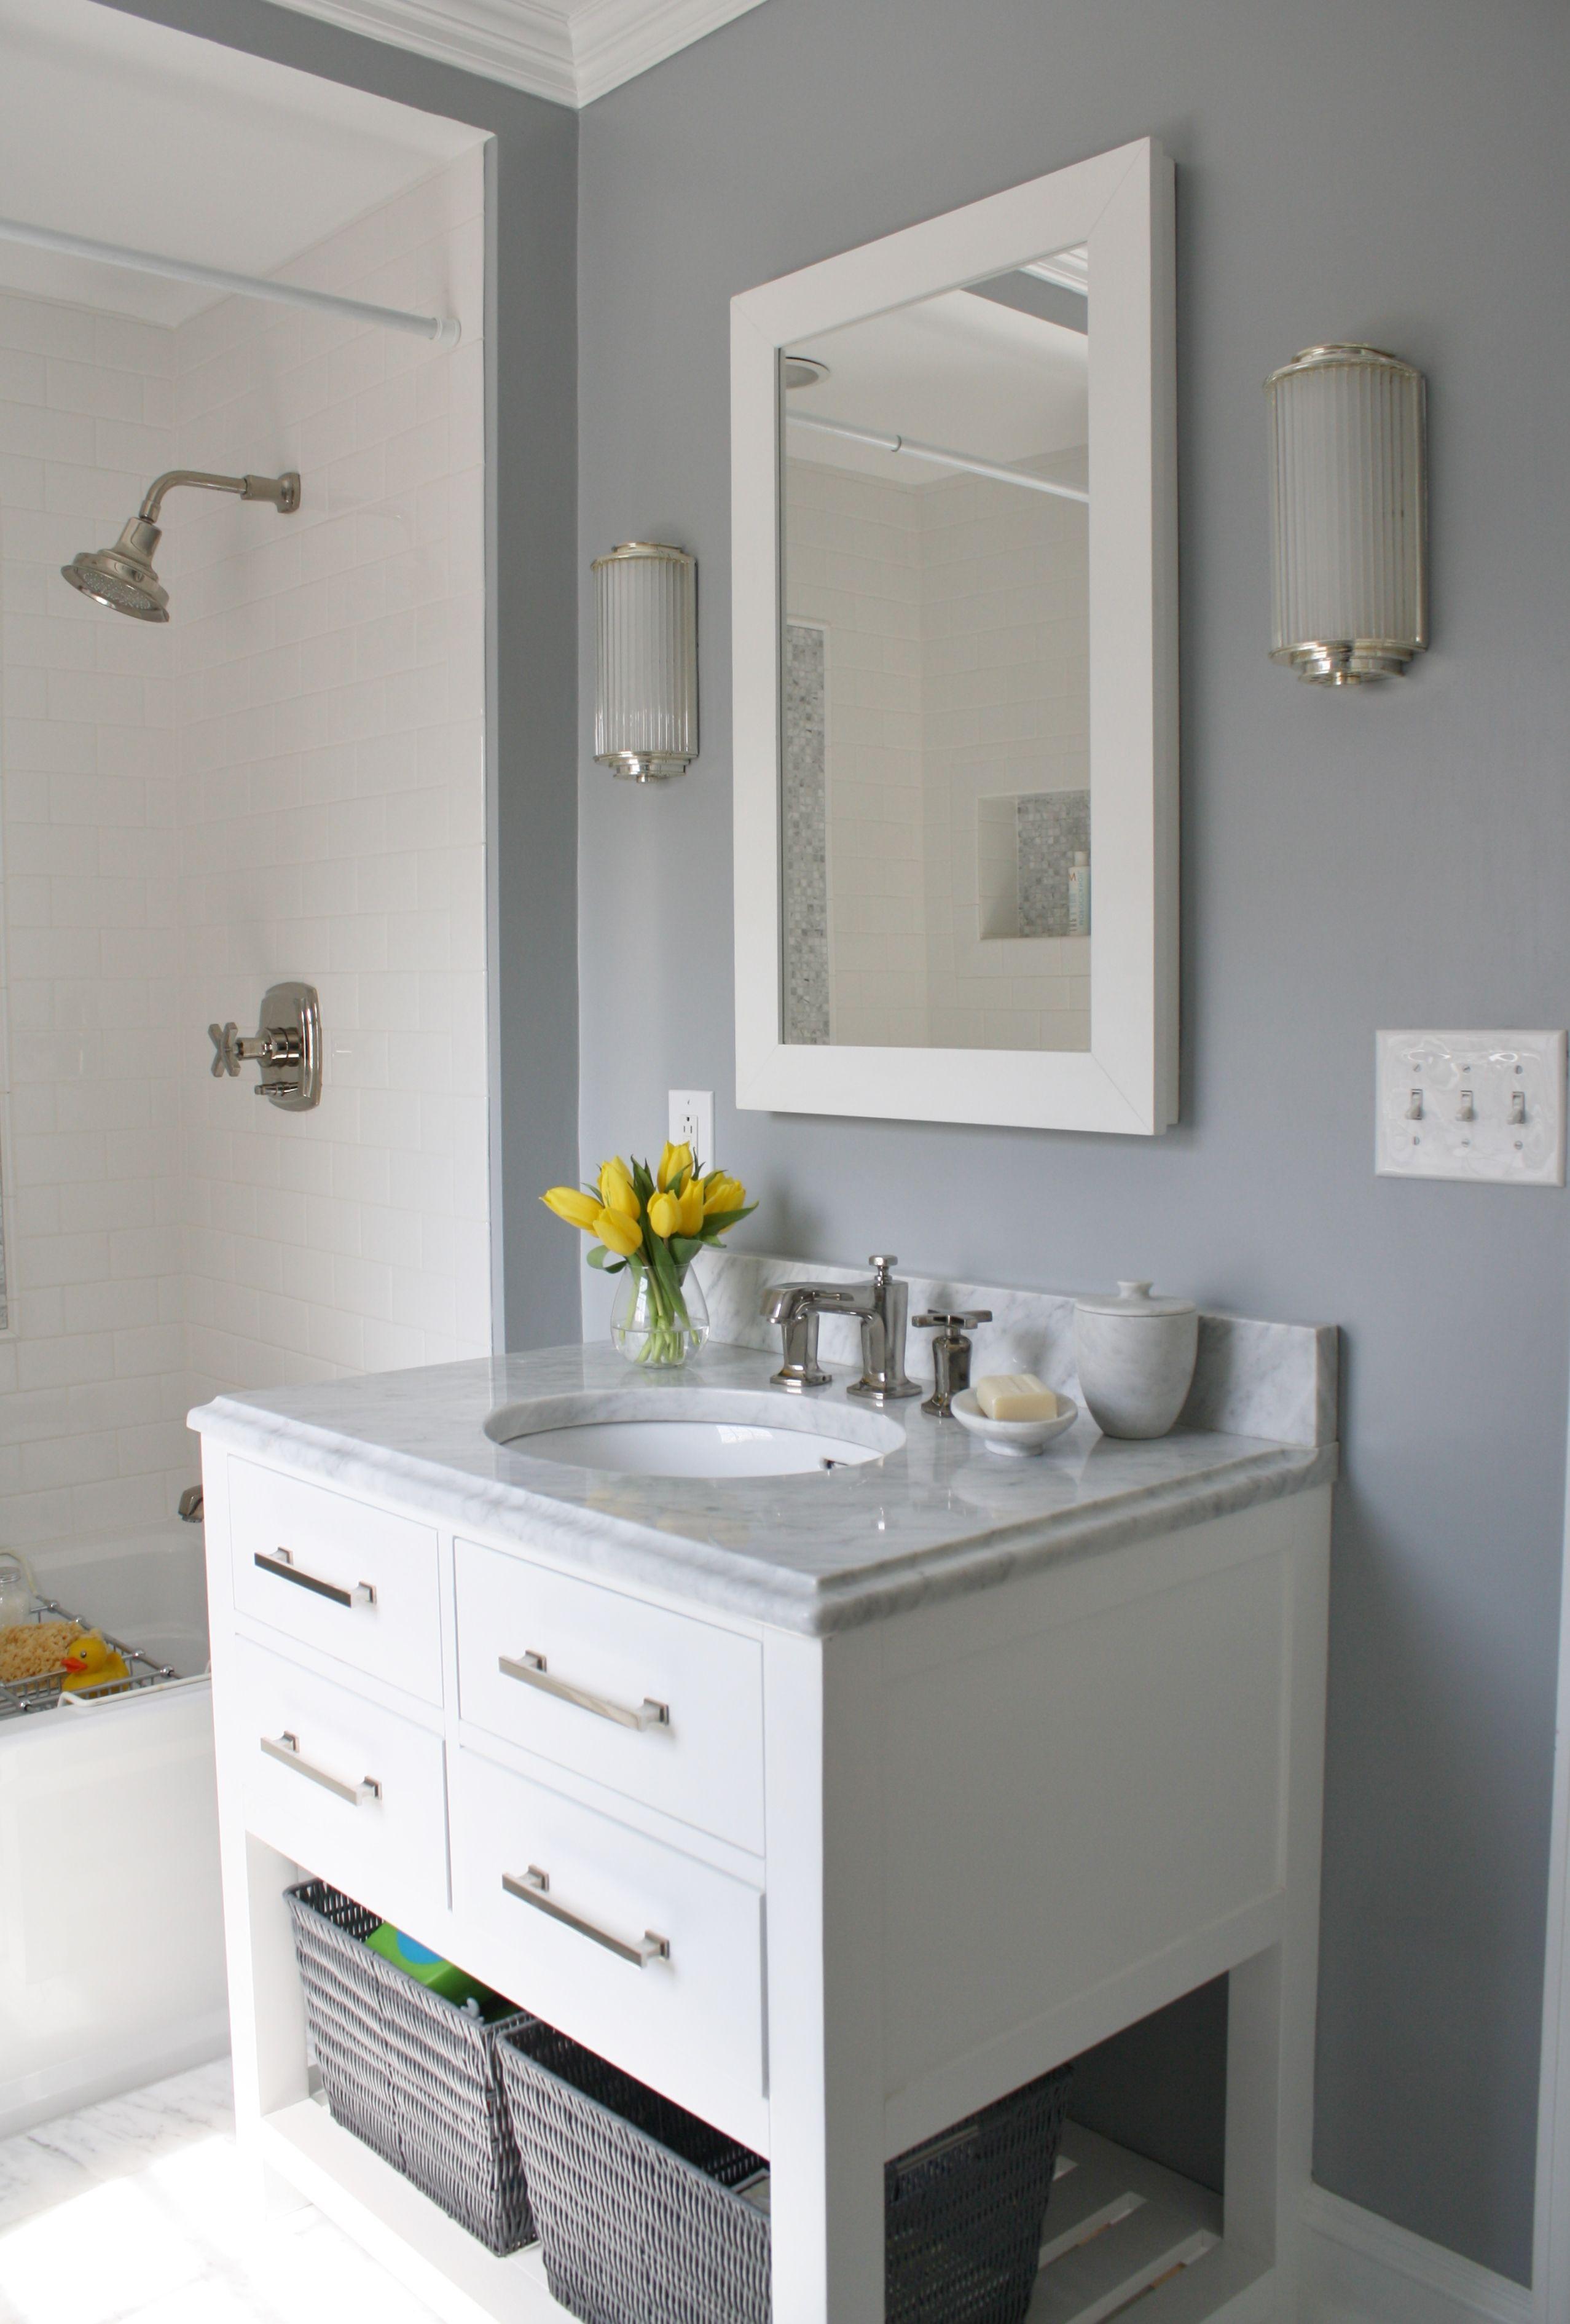 Modern Family Bath In Gray White And Yellow Color Scheme Kid Bathroom Decor Yellow Bathrooms Bathroom Vanity Designs